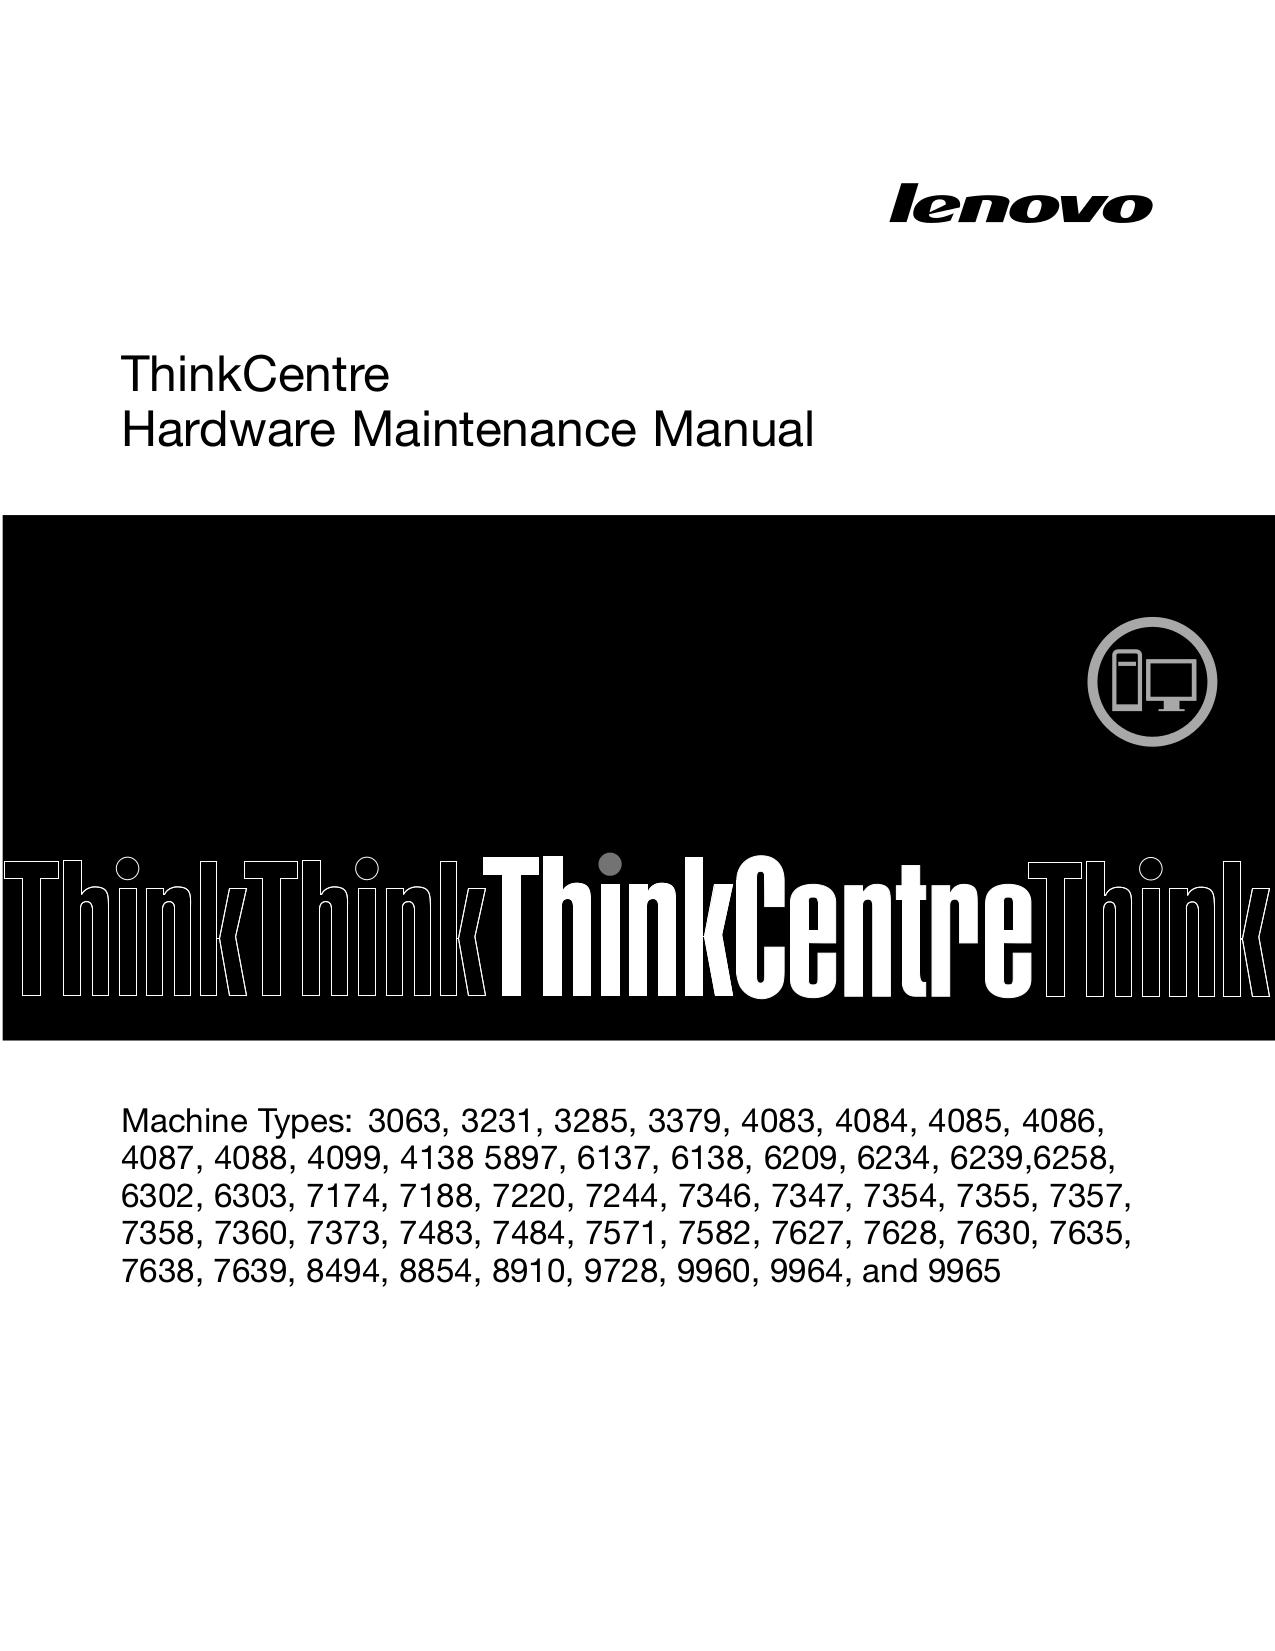 pdf for Lenovo Desktop ThinkCentre M58 7360 manual